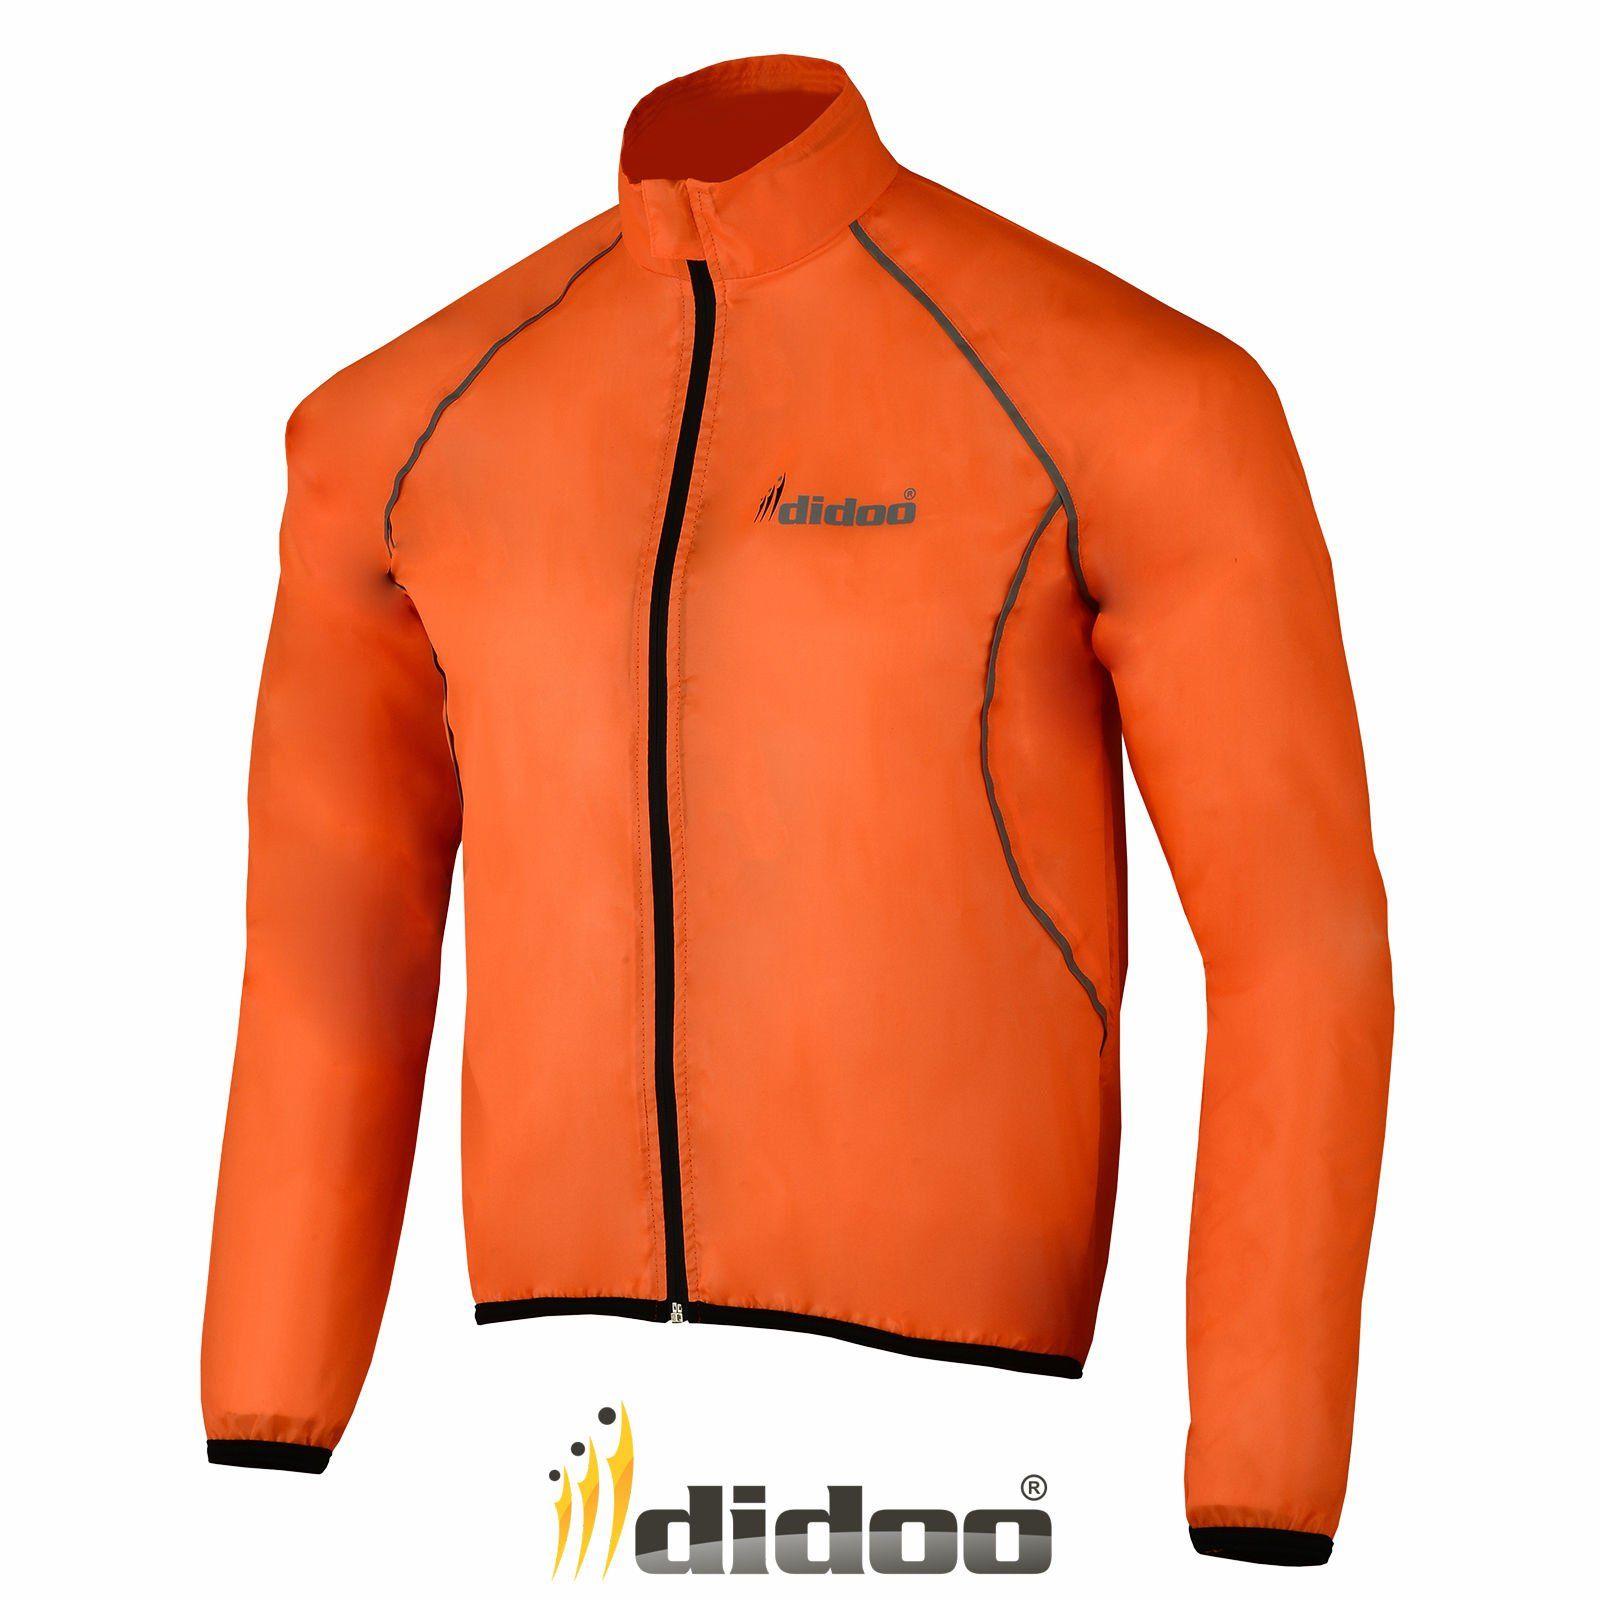 Hombres Ciclismo Rompevientos Chaqueta Ropa impermeable MTB viento reflectante